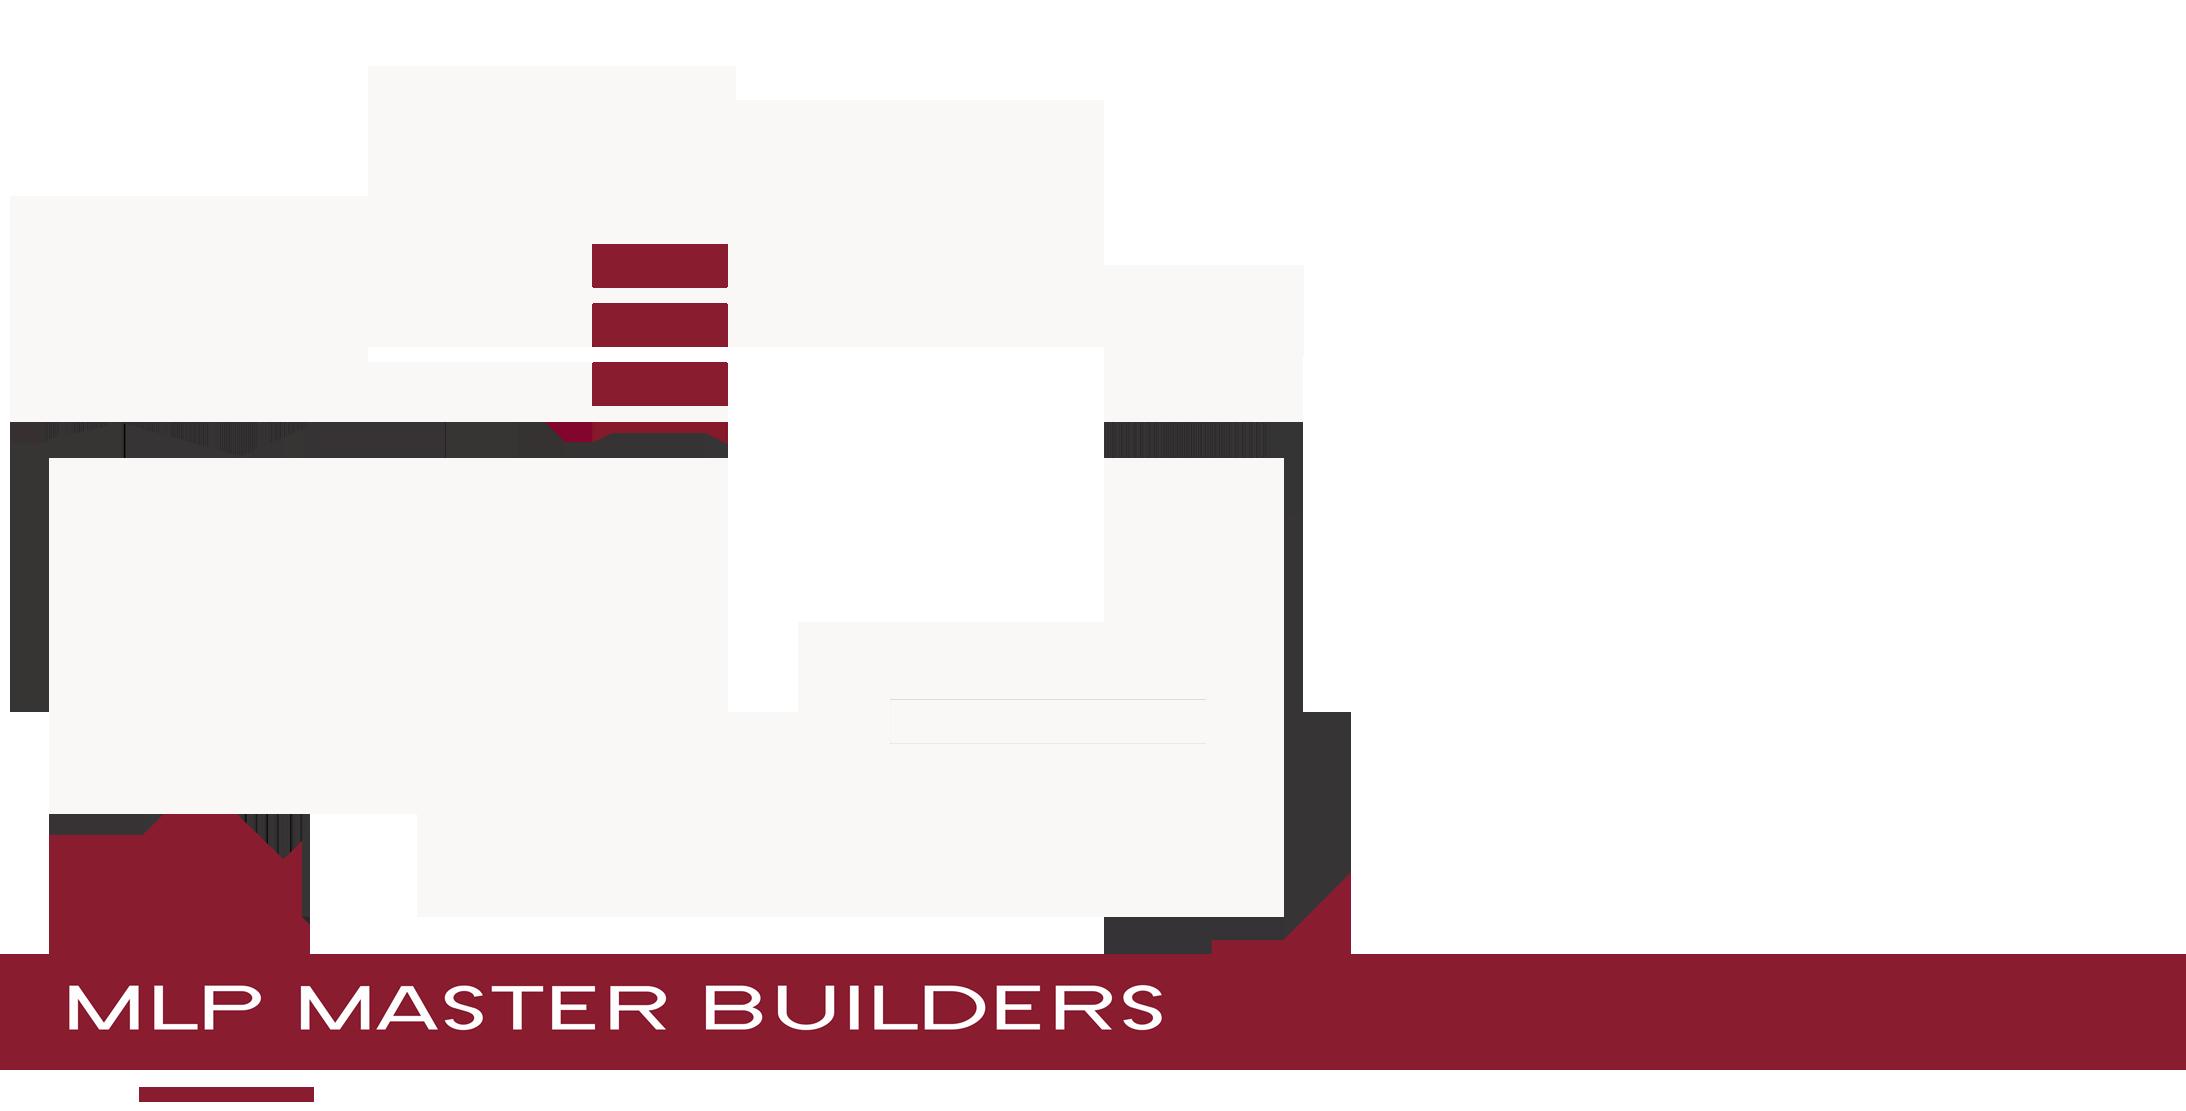 MLP Master Builders